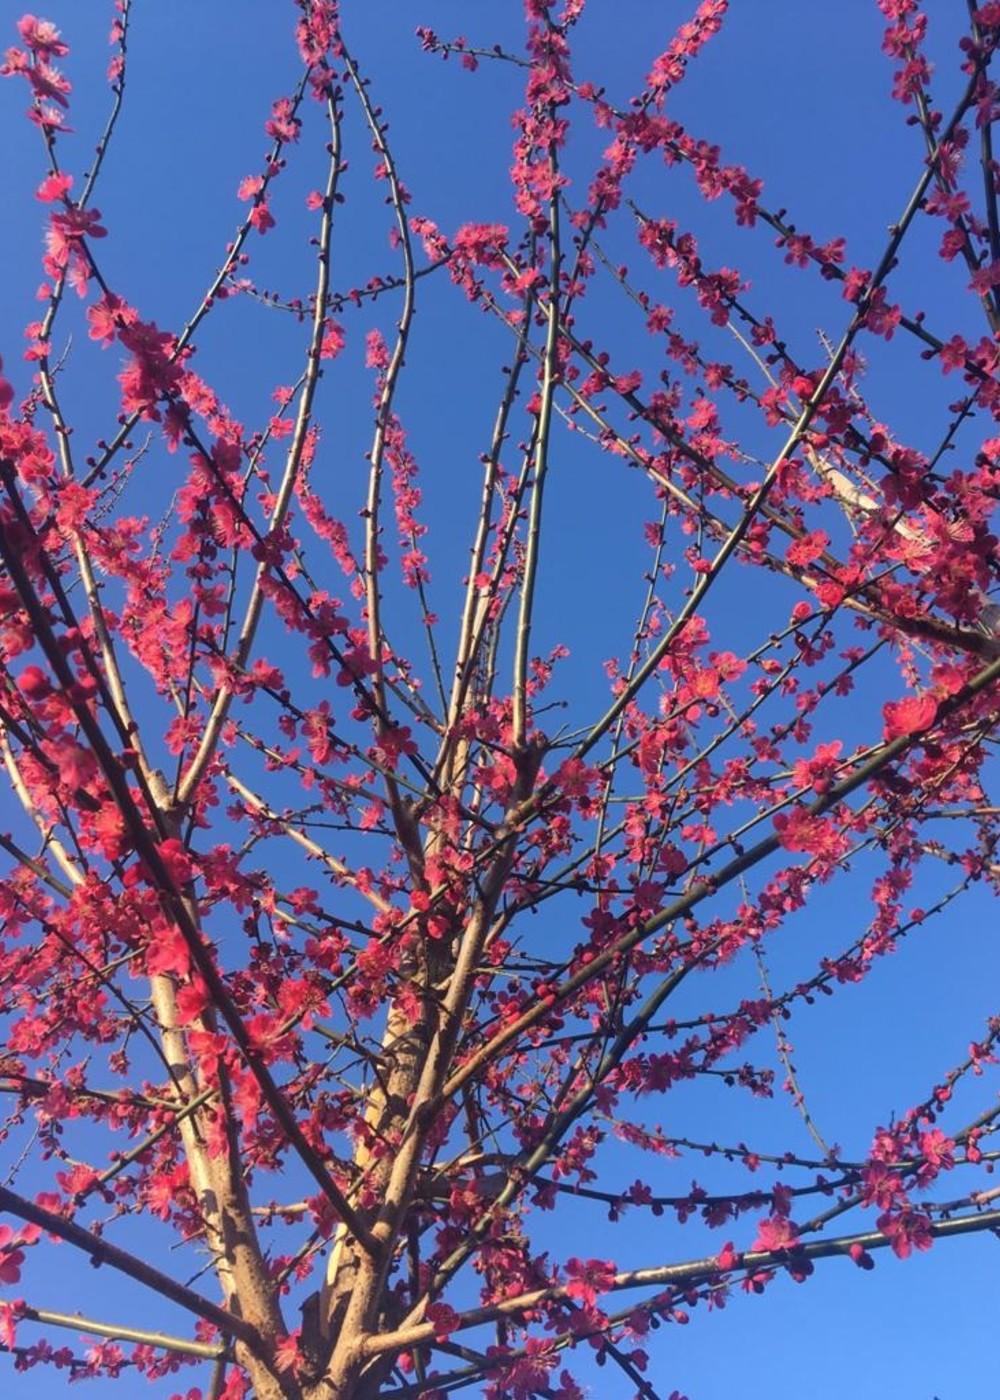 Japanische Zieraprikose | Prunus mume 'Beni-chi-dori'